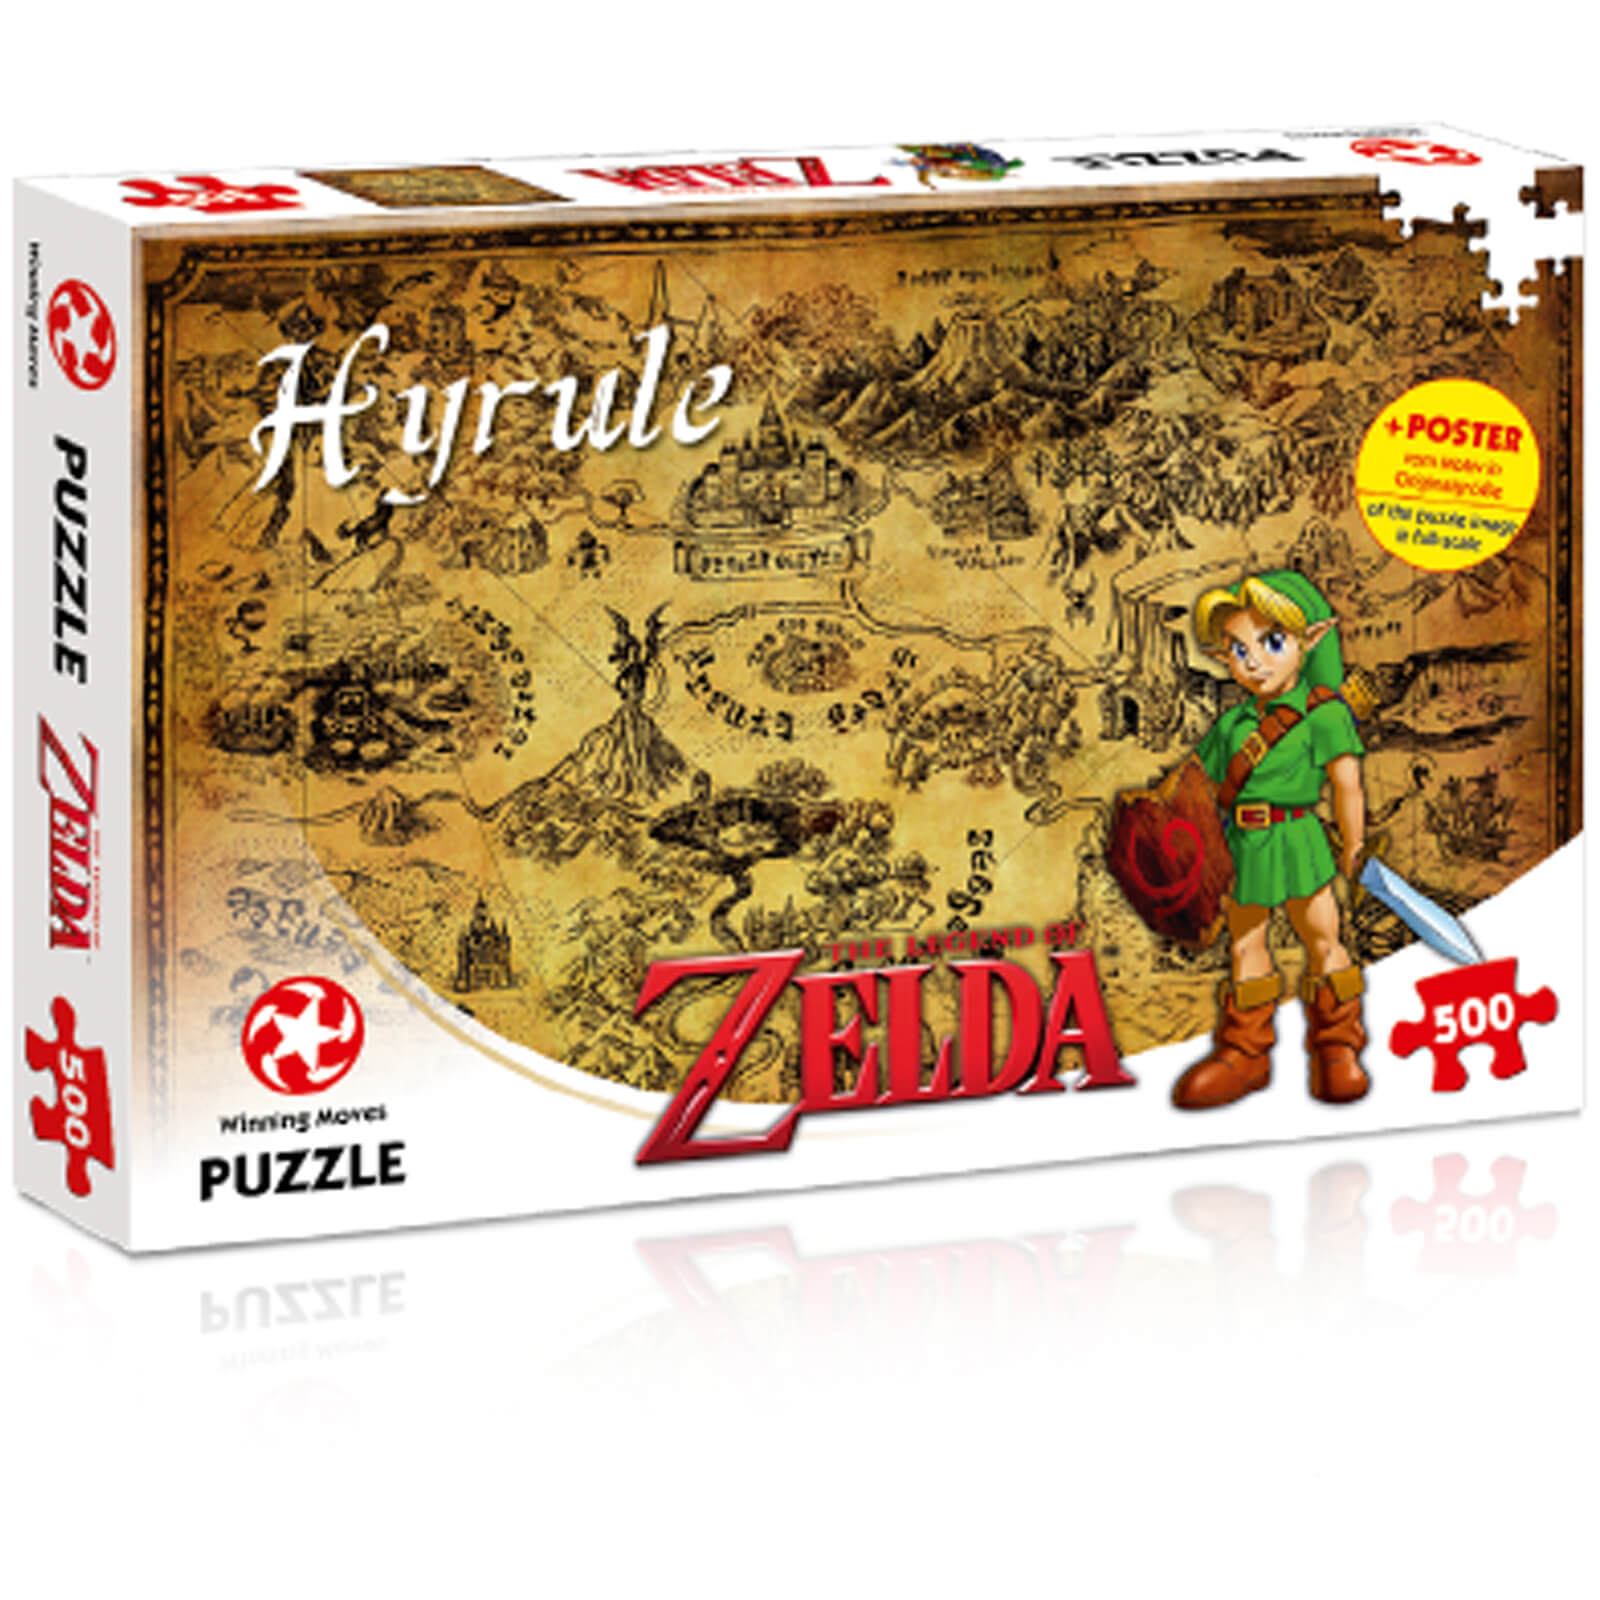 Image of 500 Piece Jigsaw Puzzle - Zelda Hyrule Field Edition